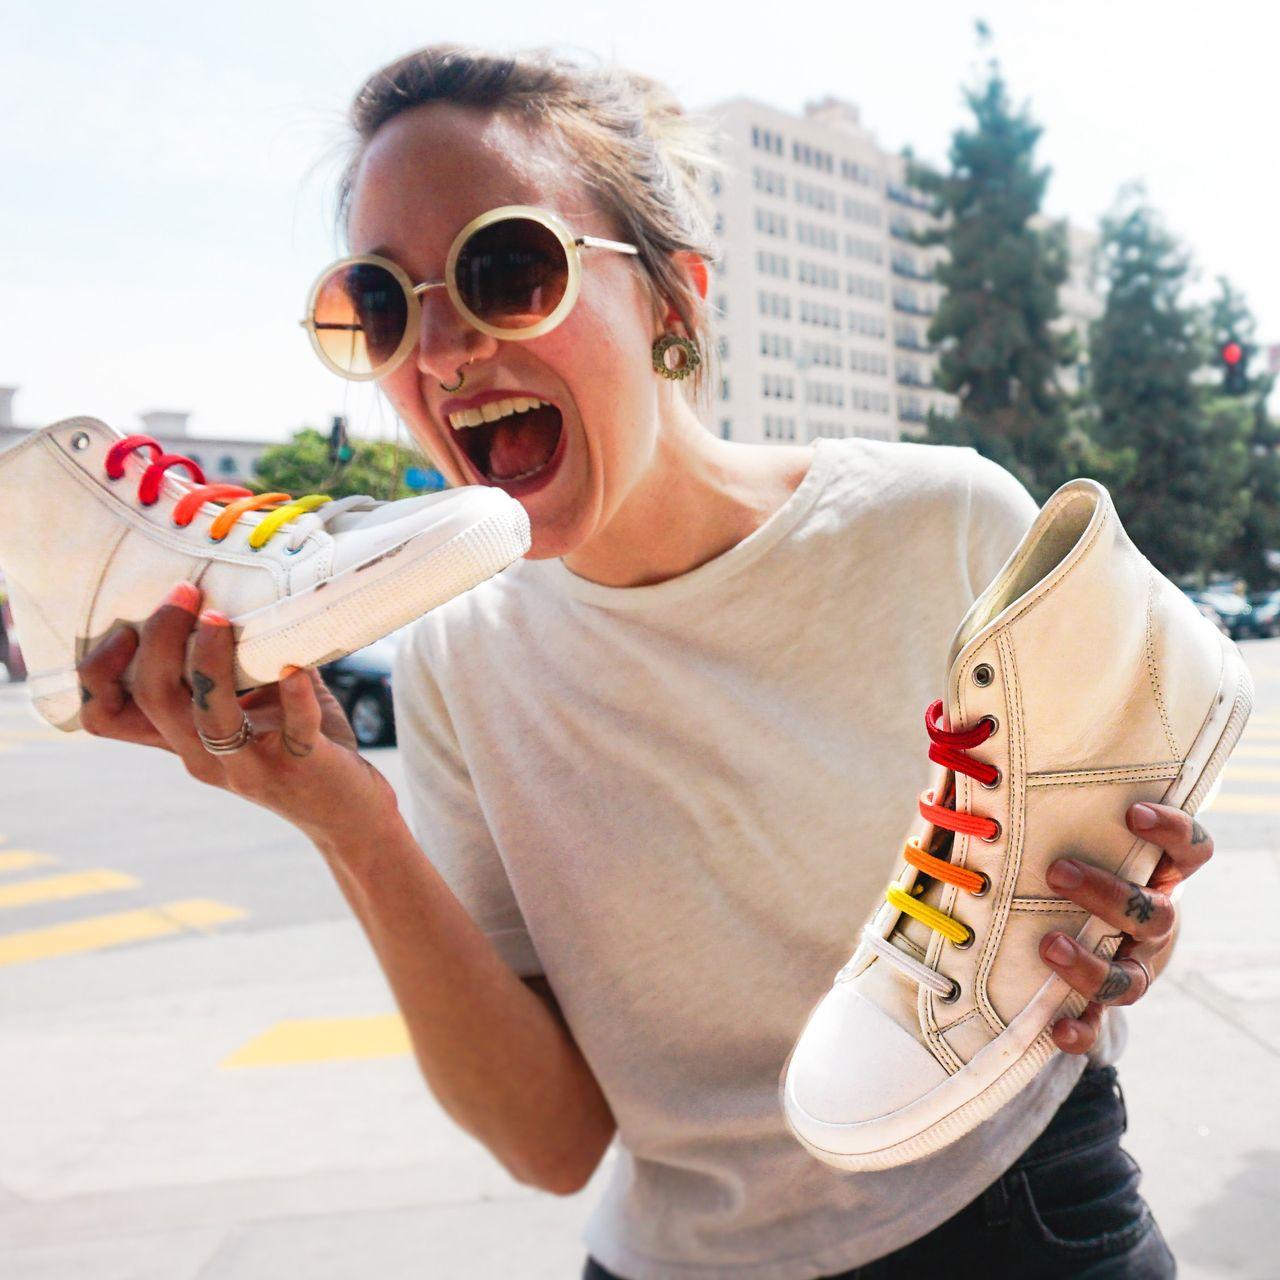 Choosing the Best Sneakers for Women